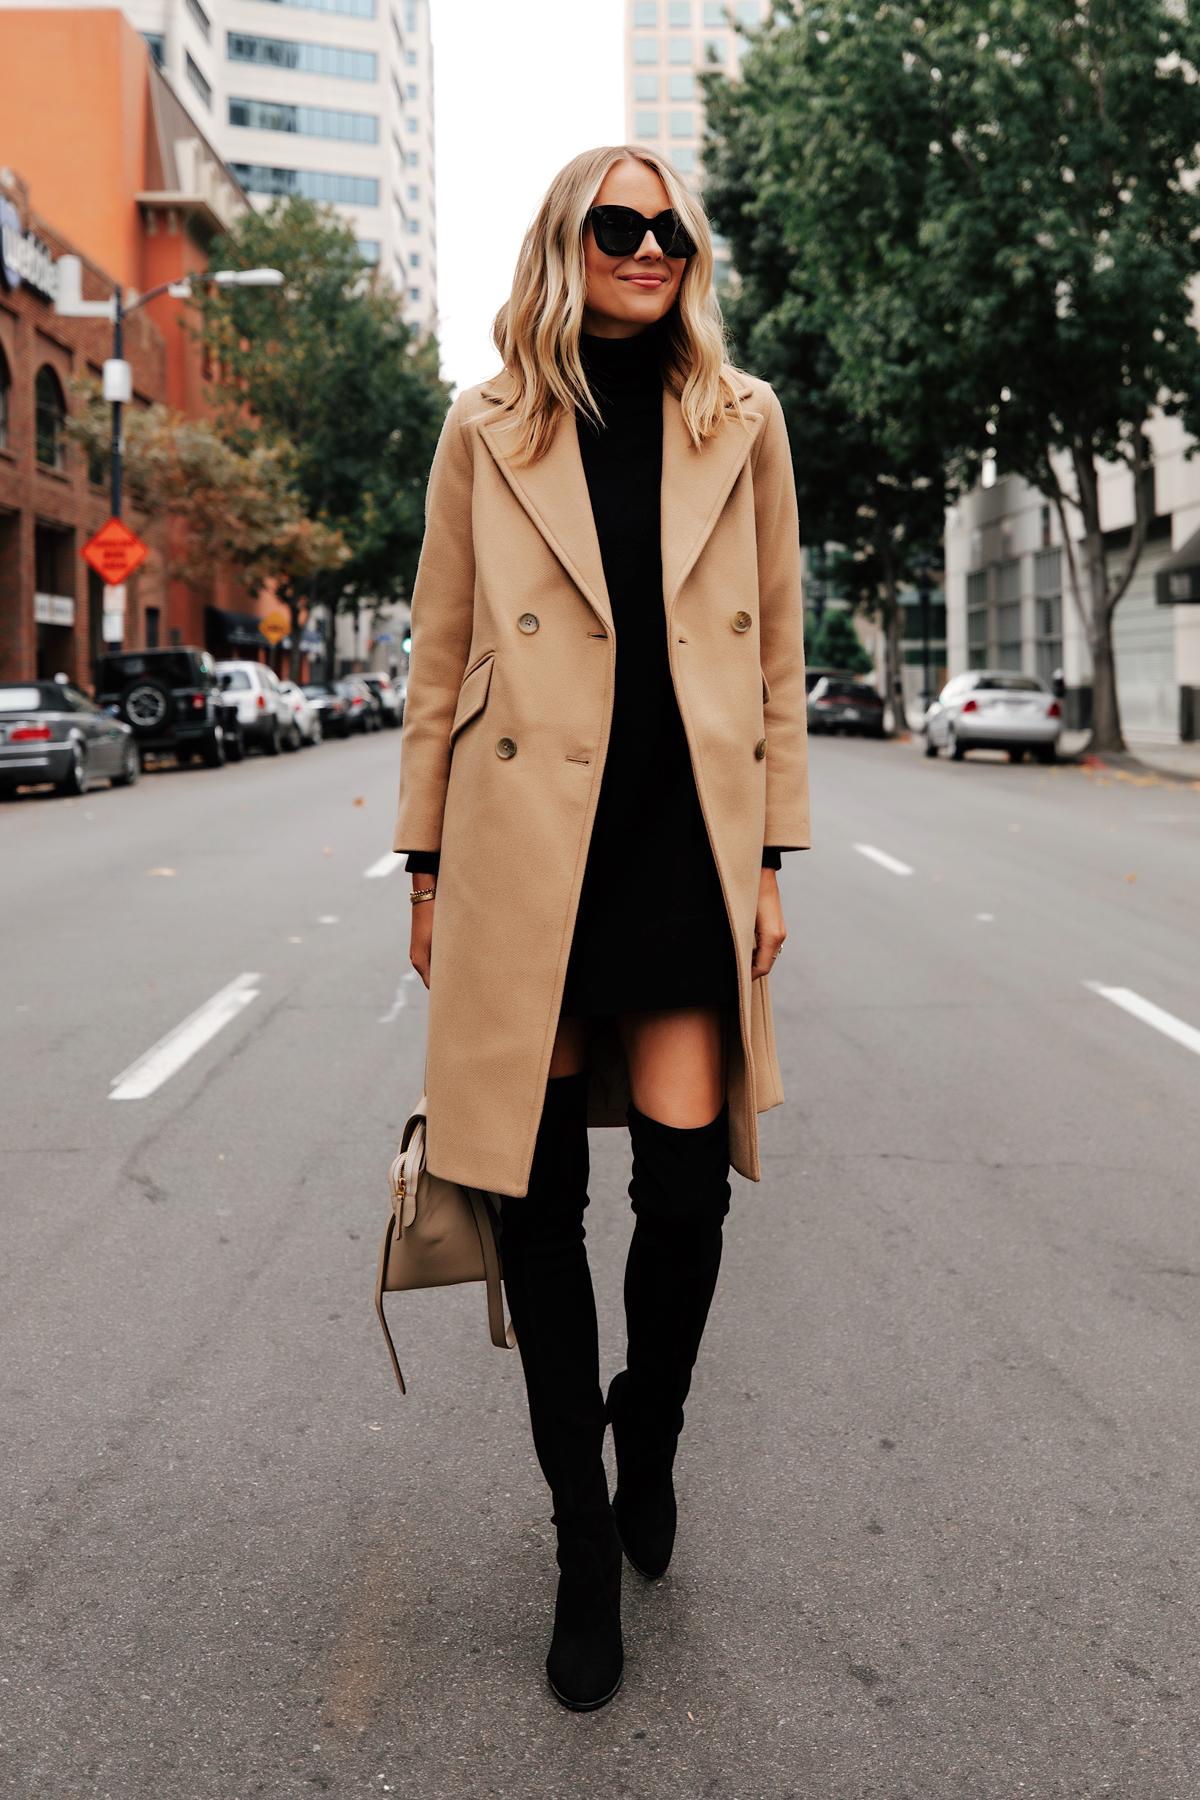 Fashion Jackson Wearing Everlane Camel Coat Black Sweater Dress Stuart Weitzman Black Over the Knee Boots